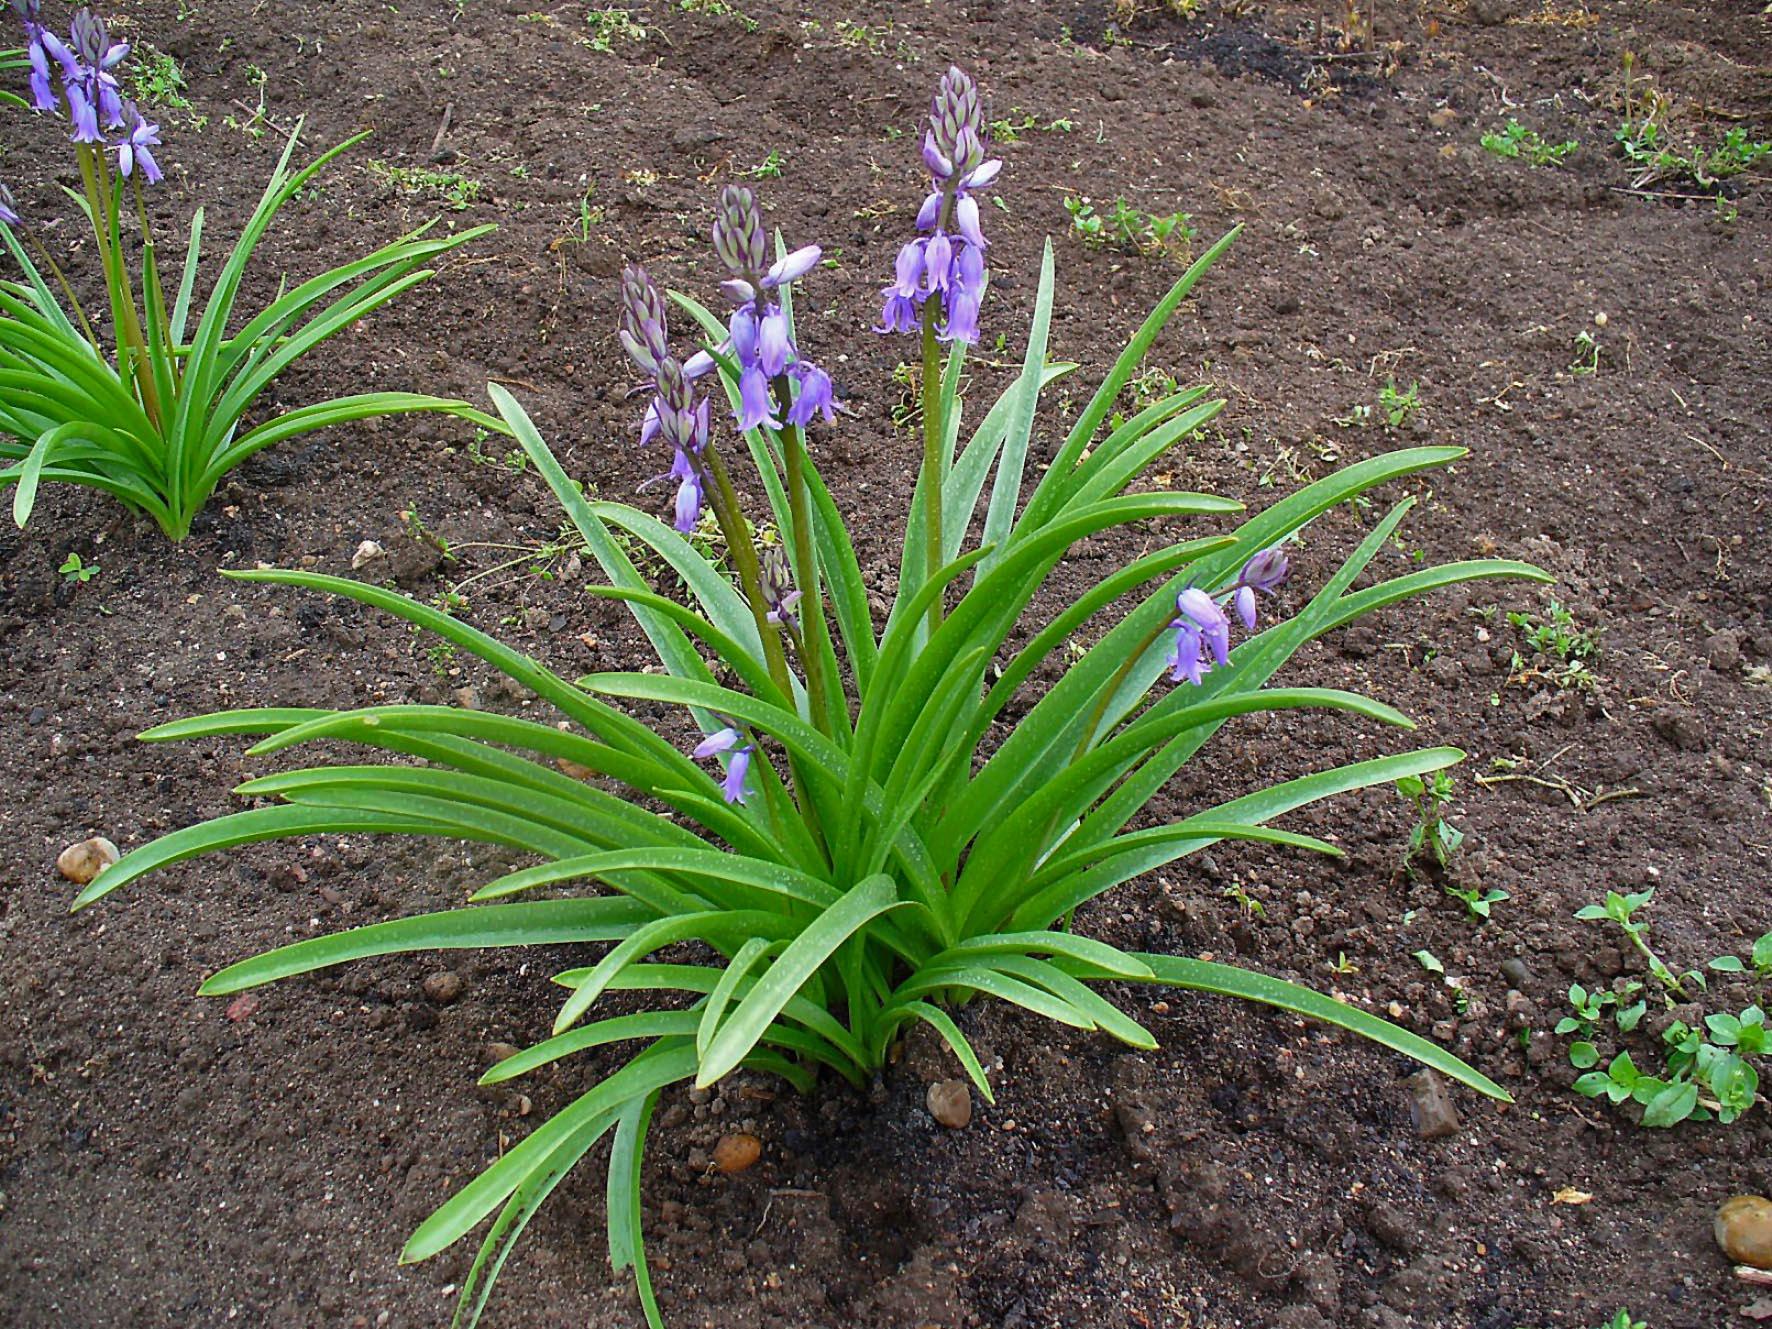 Bluebell. (Hyacinth Family).